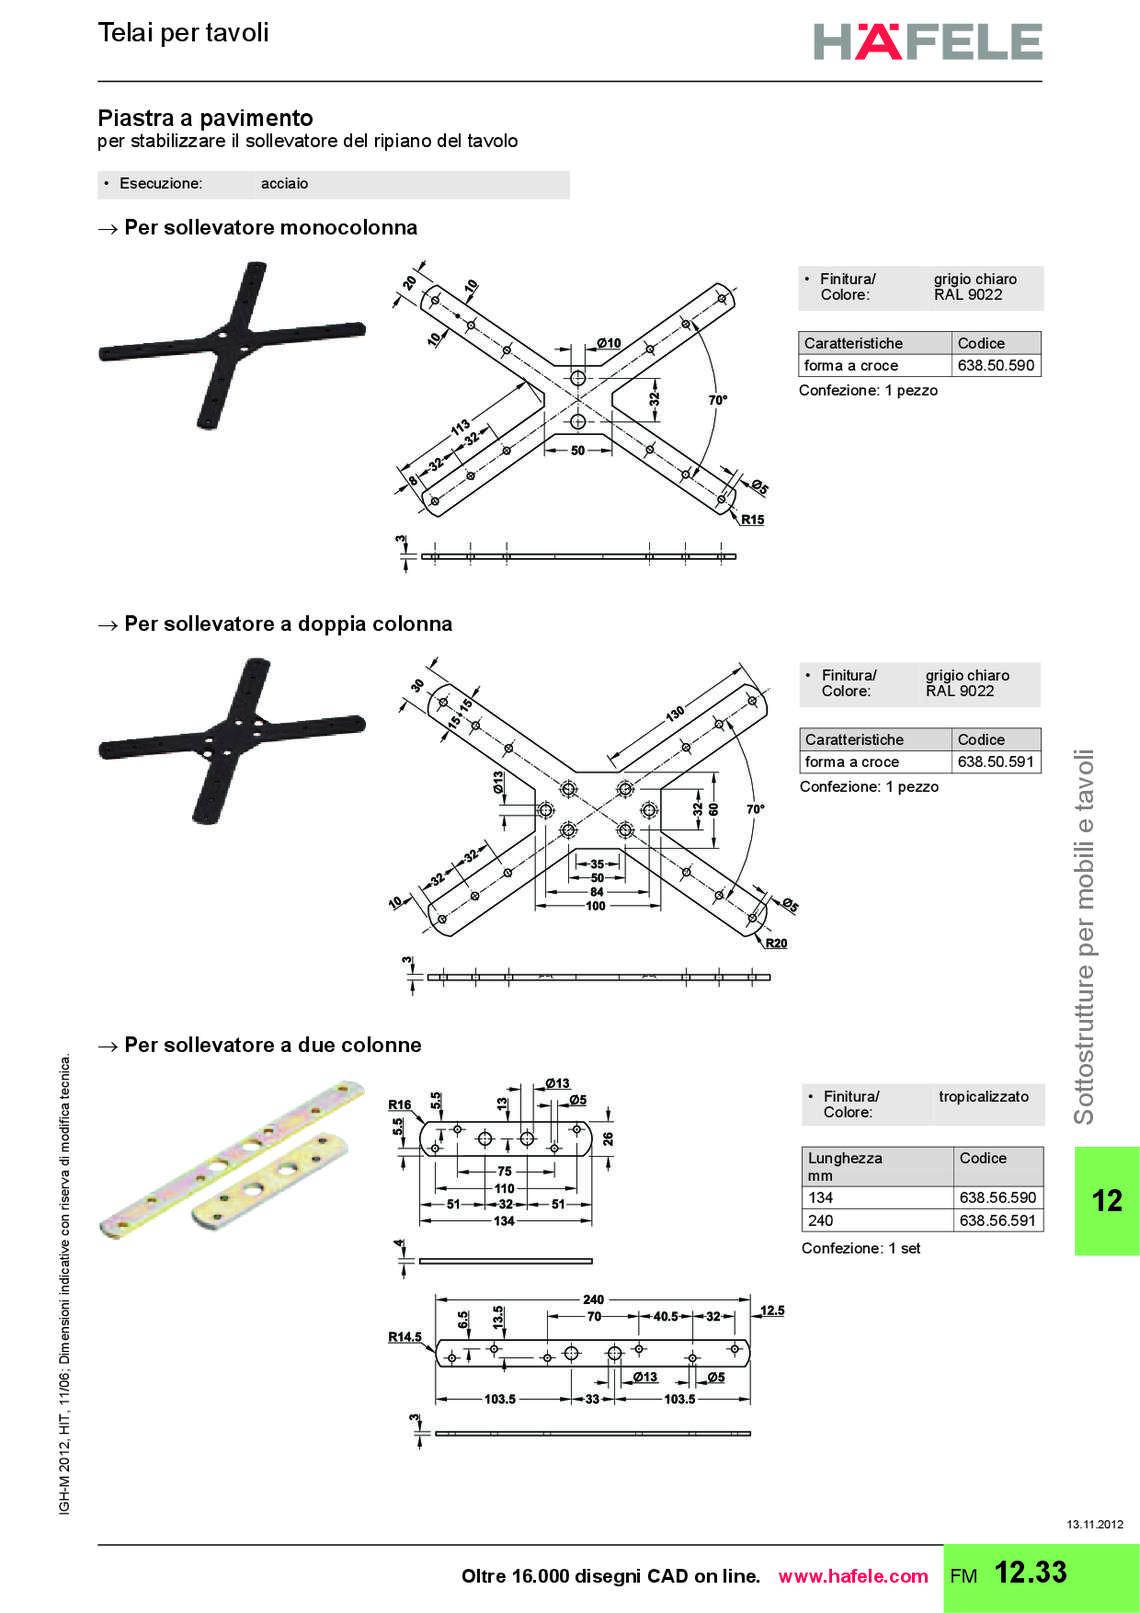 hafele-sottostrutture-per-mobili_83_056.jpg